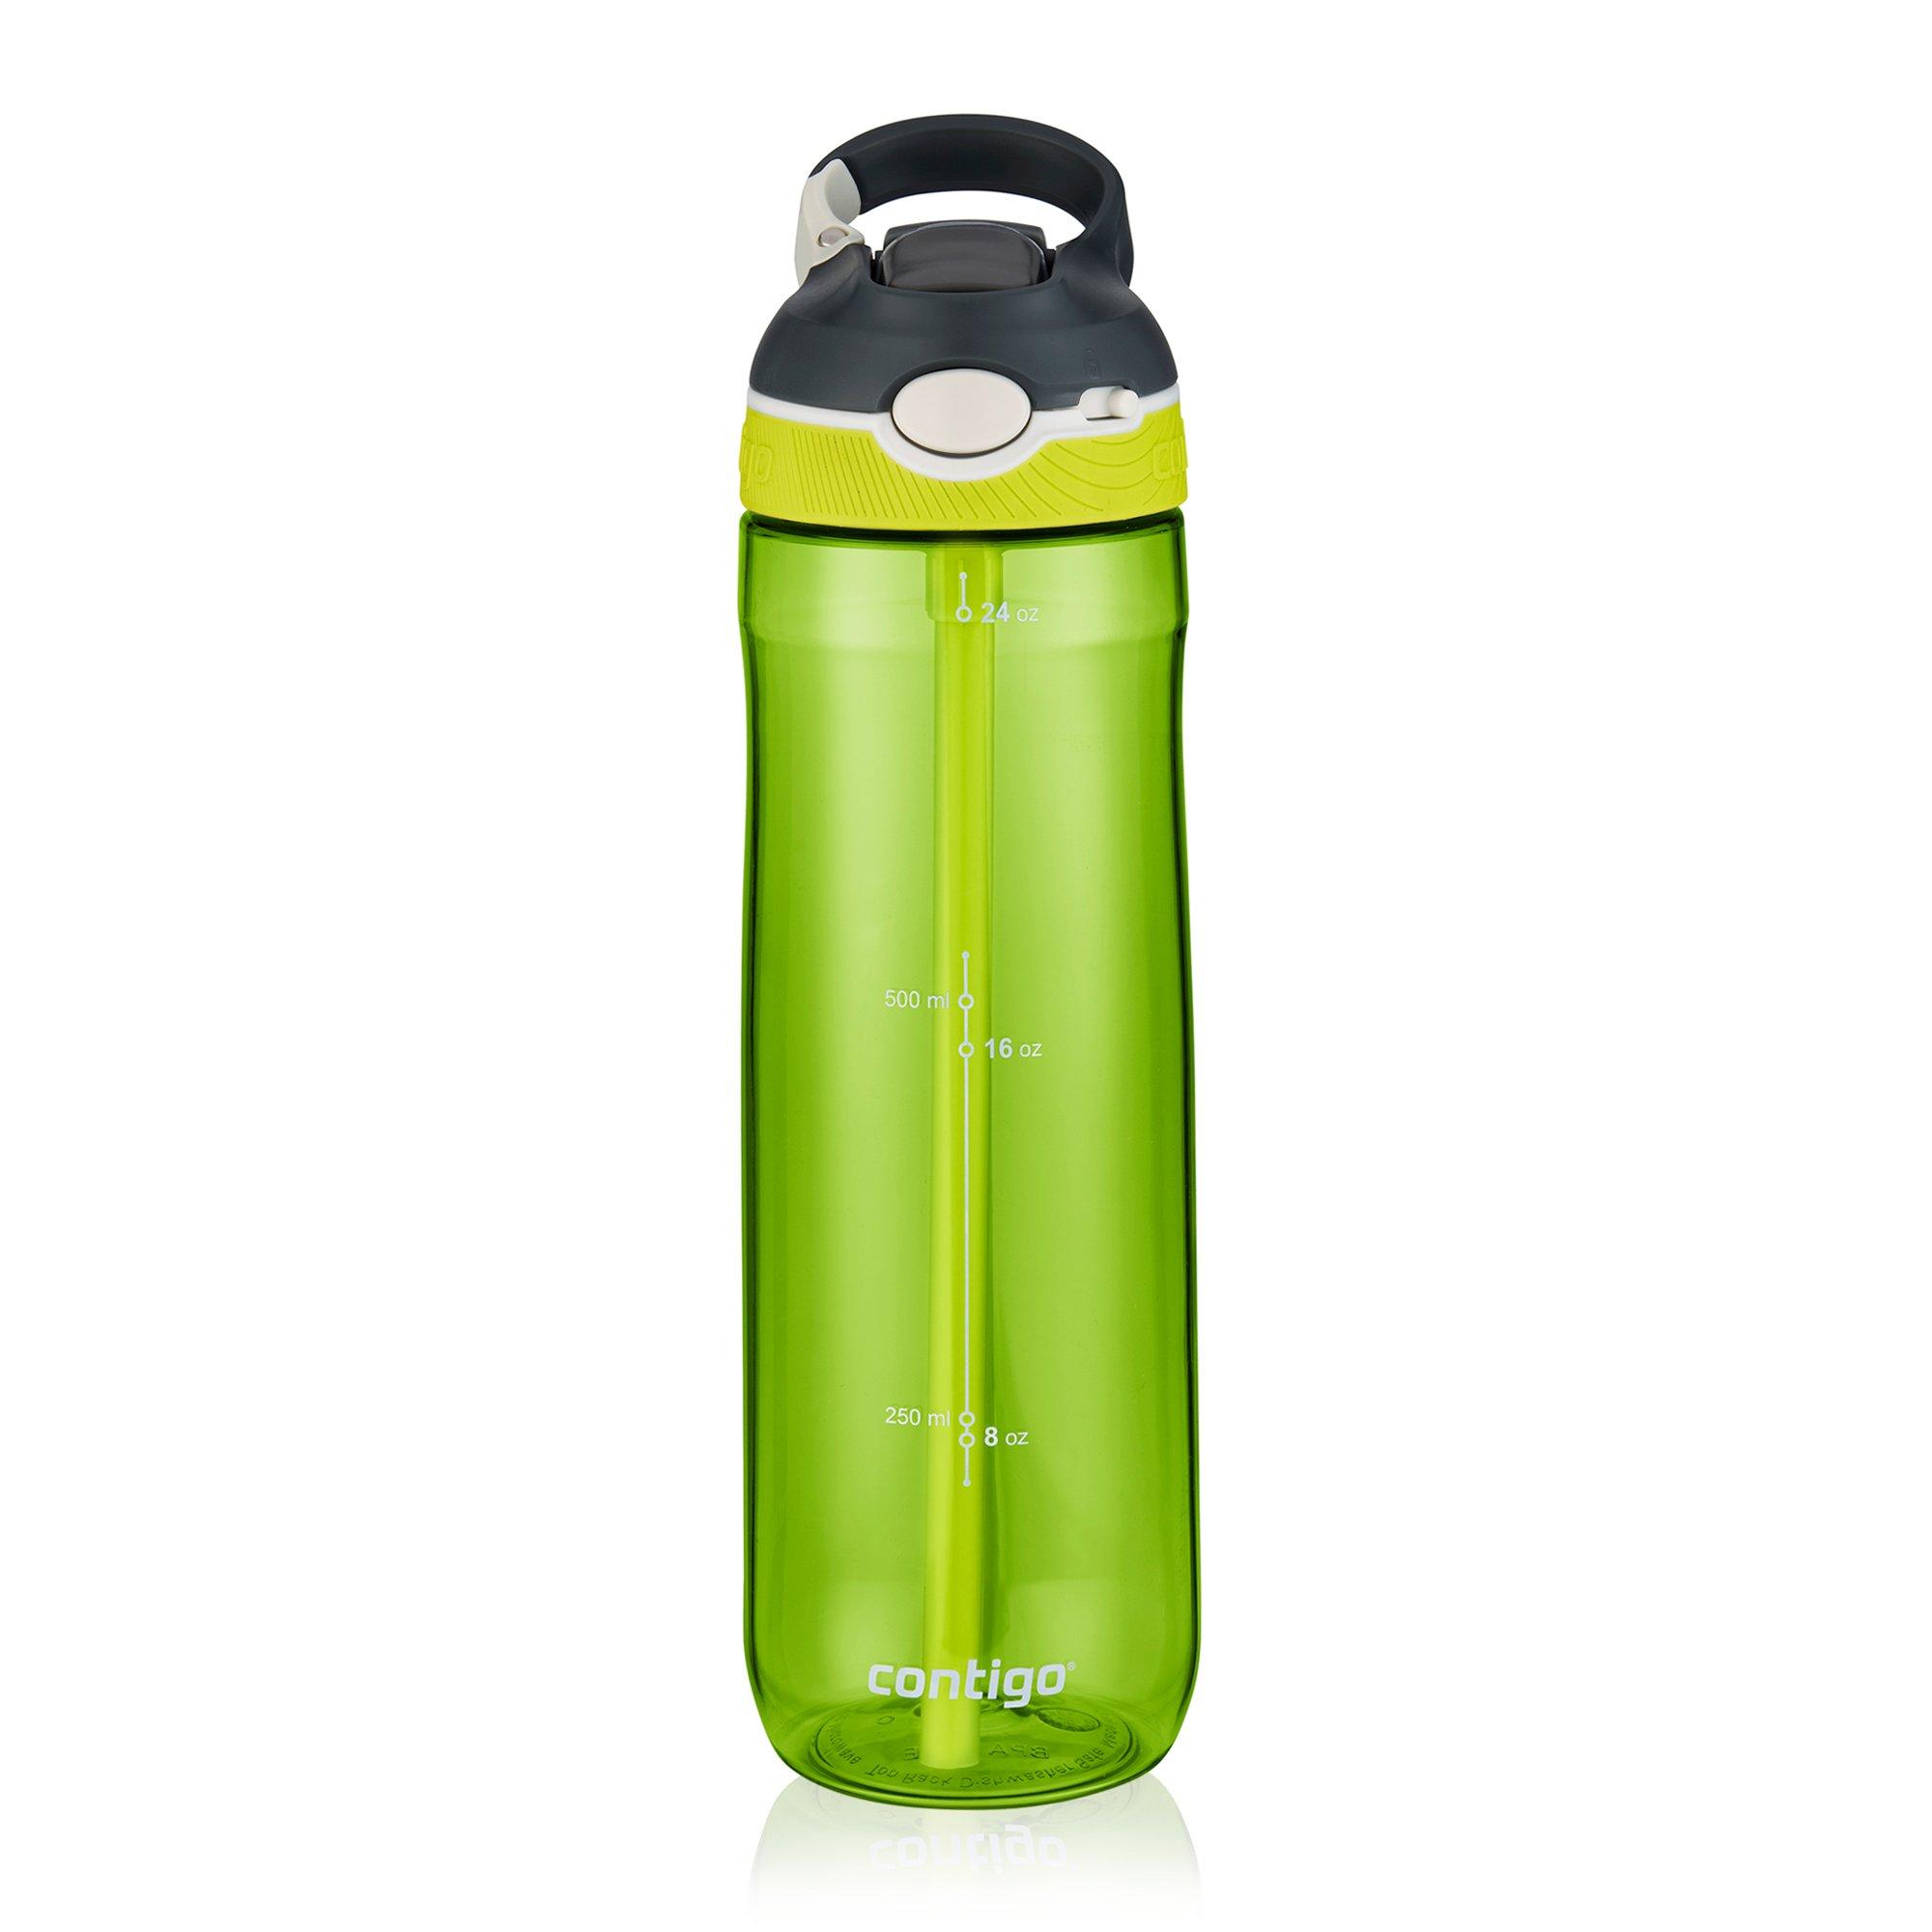 Contigo AUTOSPOUT Straw Ashland Water Bottle, 24 oz, Stormy Weather/Vibrant Lime/Monaco, 3-pack by Contigo (Image #6)